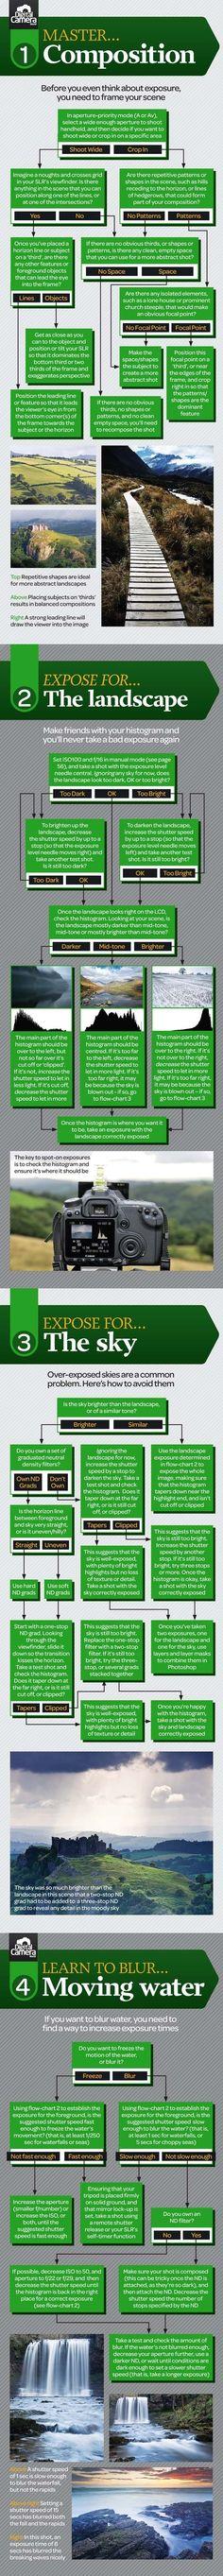 Landscape photography cheat sheet